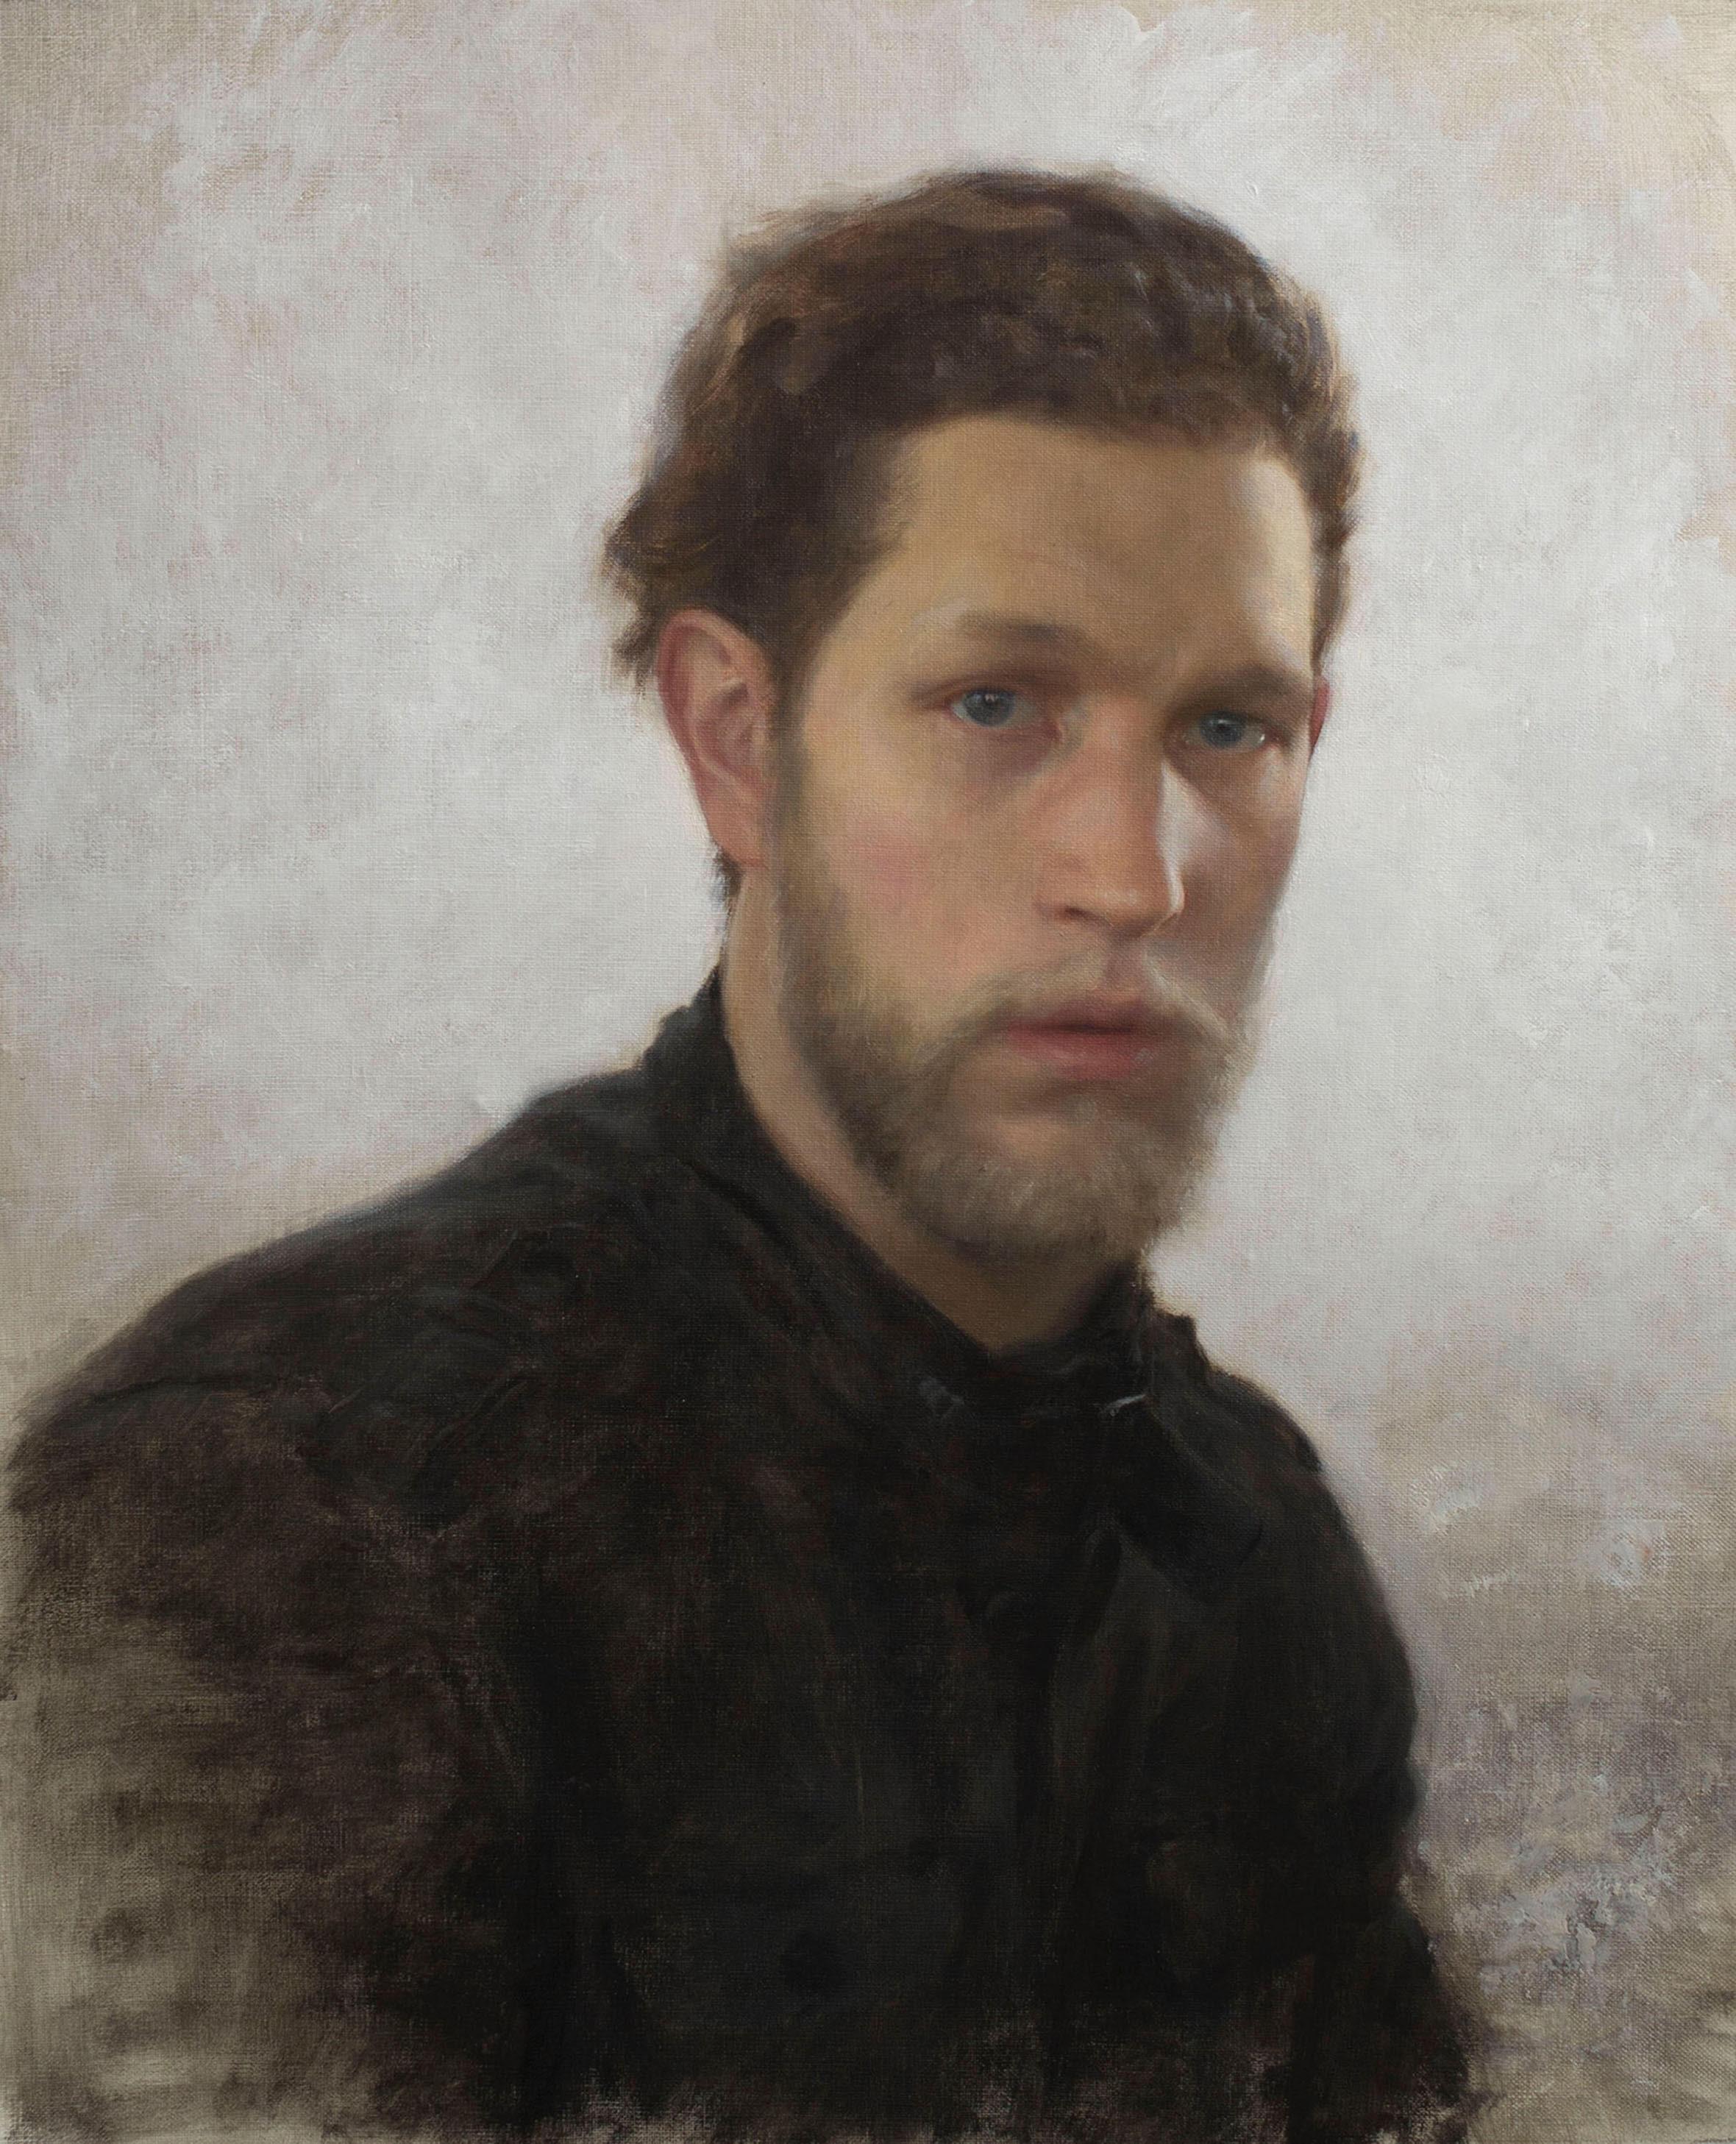 Self Reflection, 20 x 16, by Joshua LaRock